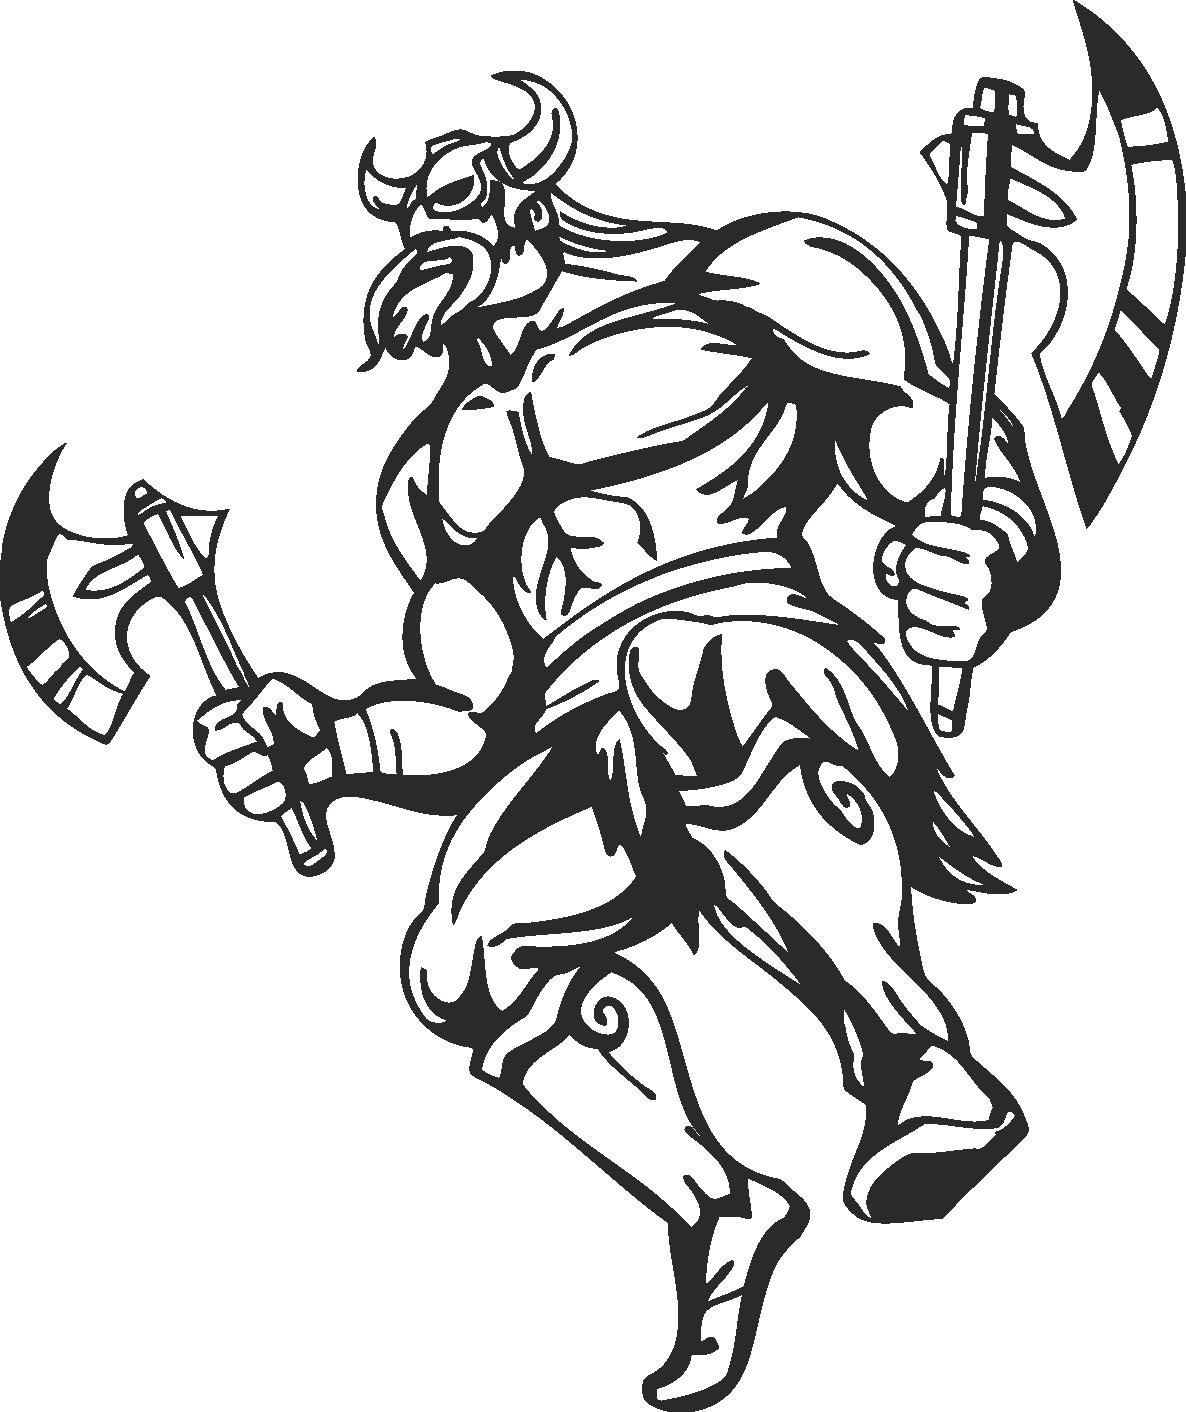 Warriors Vikings Vector 13 Free DXF File